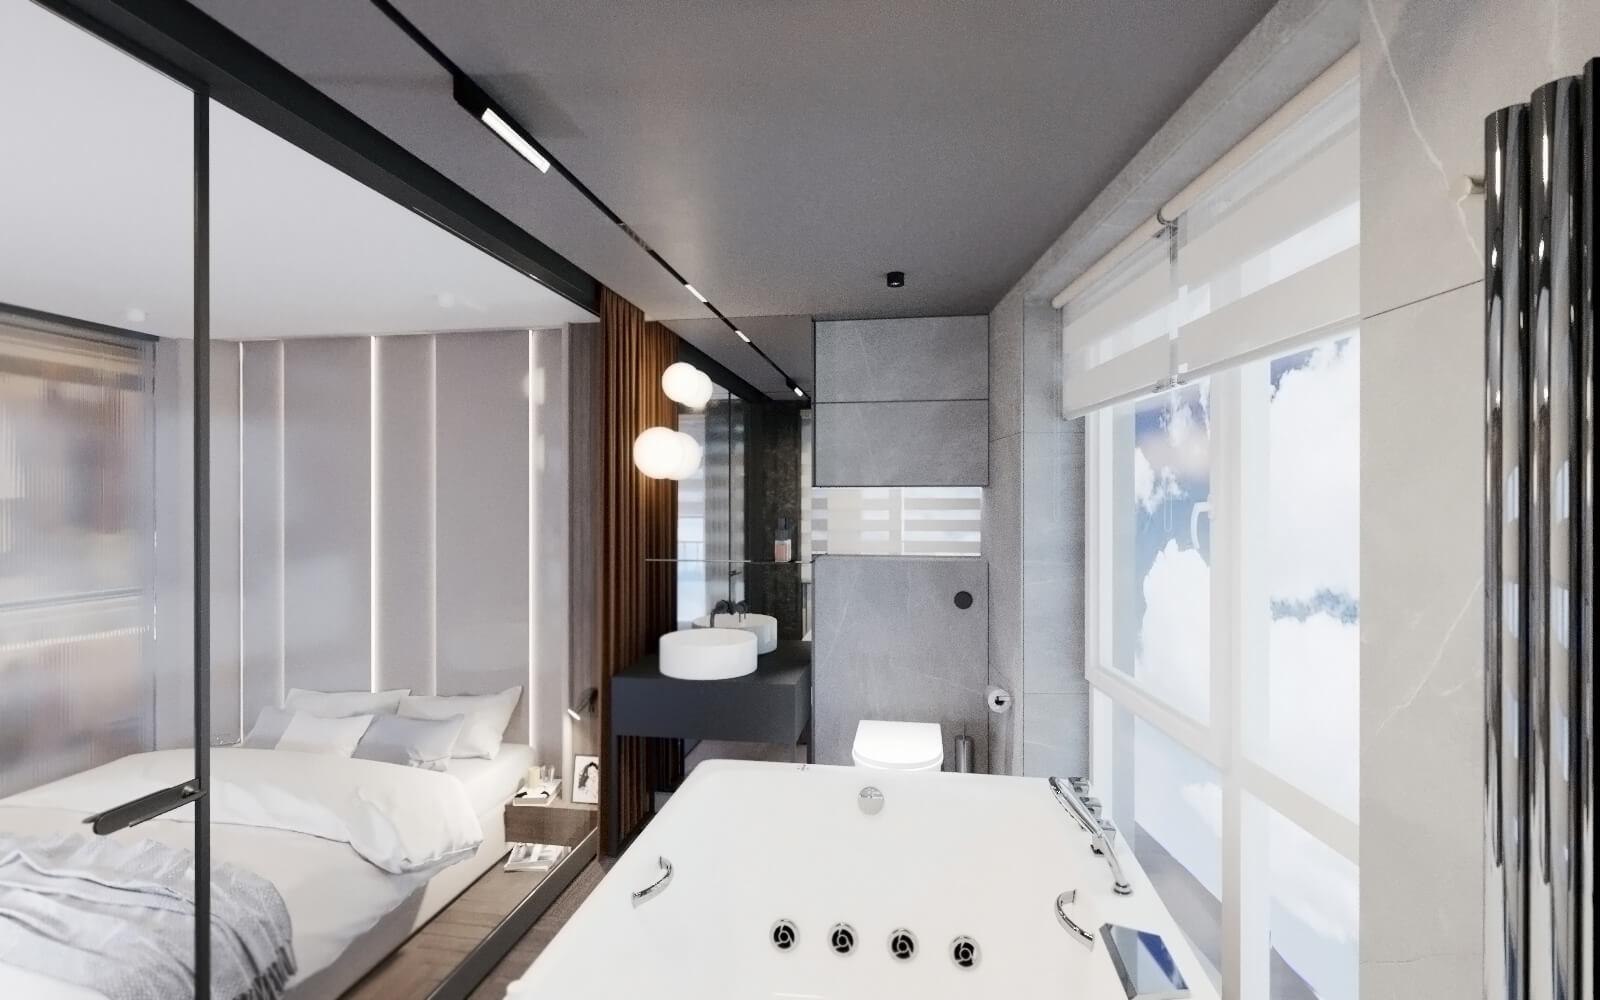 объединение туалета и ванной